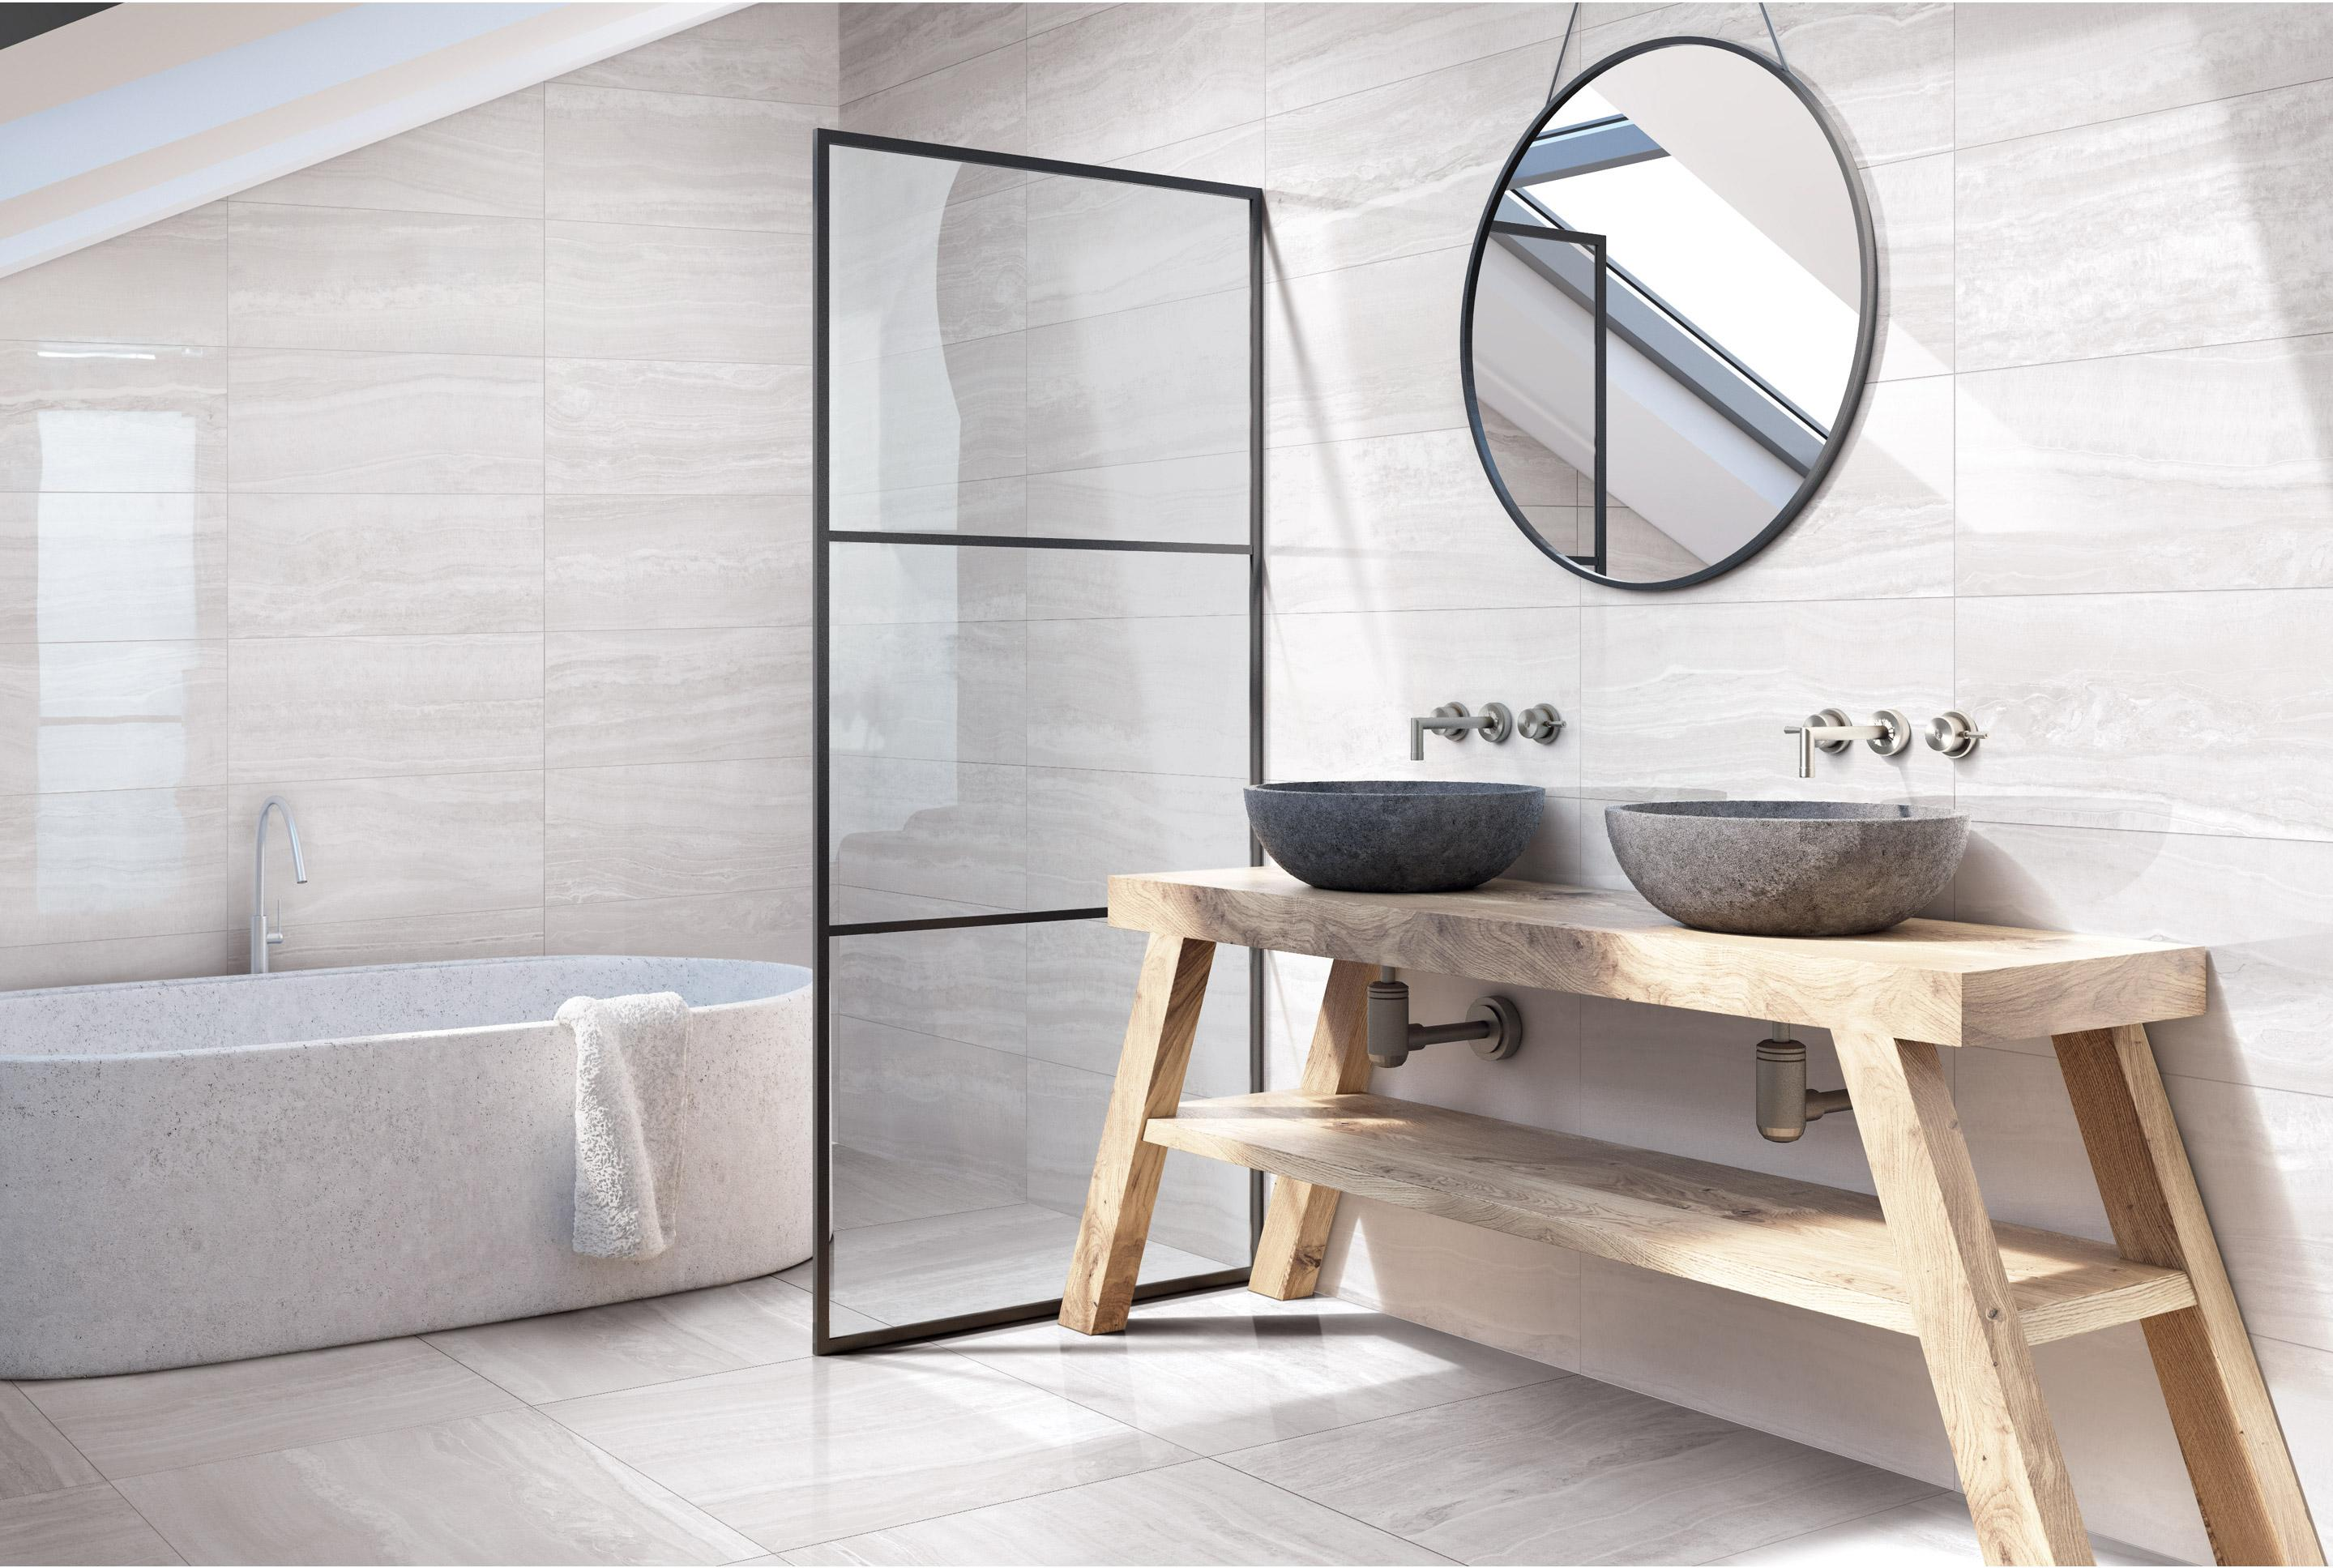 Comment Nettoyer Joint Blanc Carrelage Sol carrelage sol et mur intenso onyx blanc rimini l.60xl.60cm cerim inspired+39